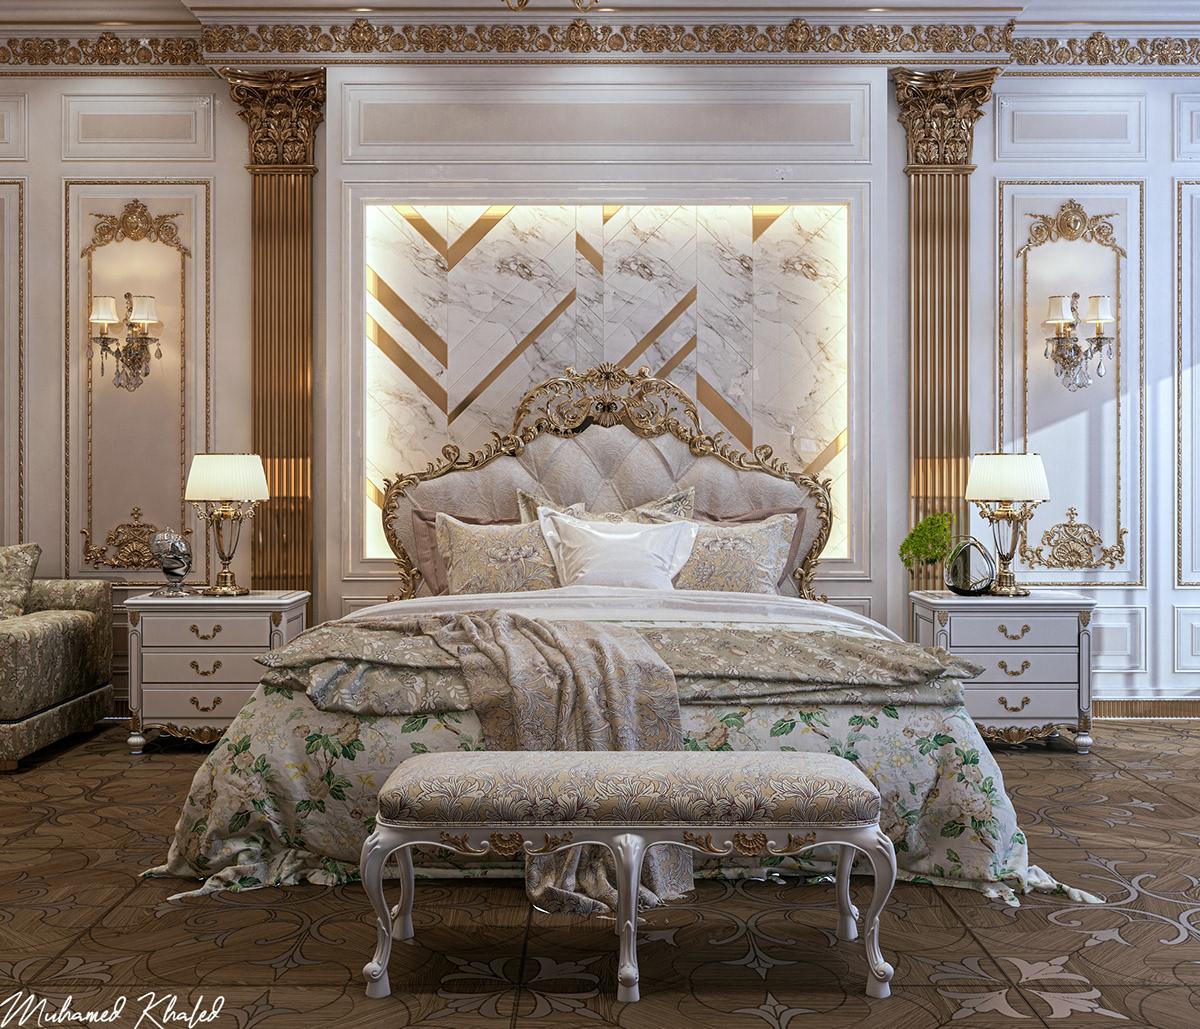 Classic Bedroom Design on Behance